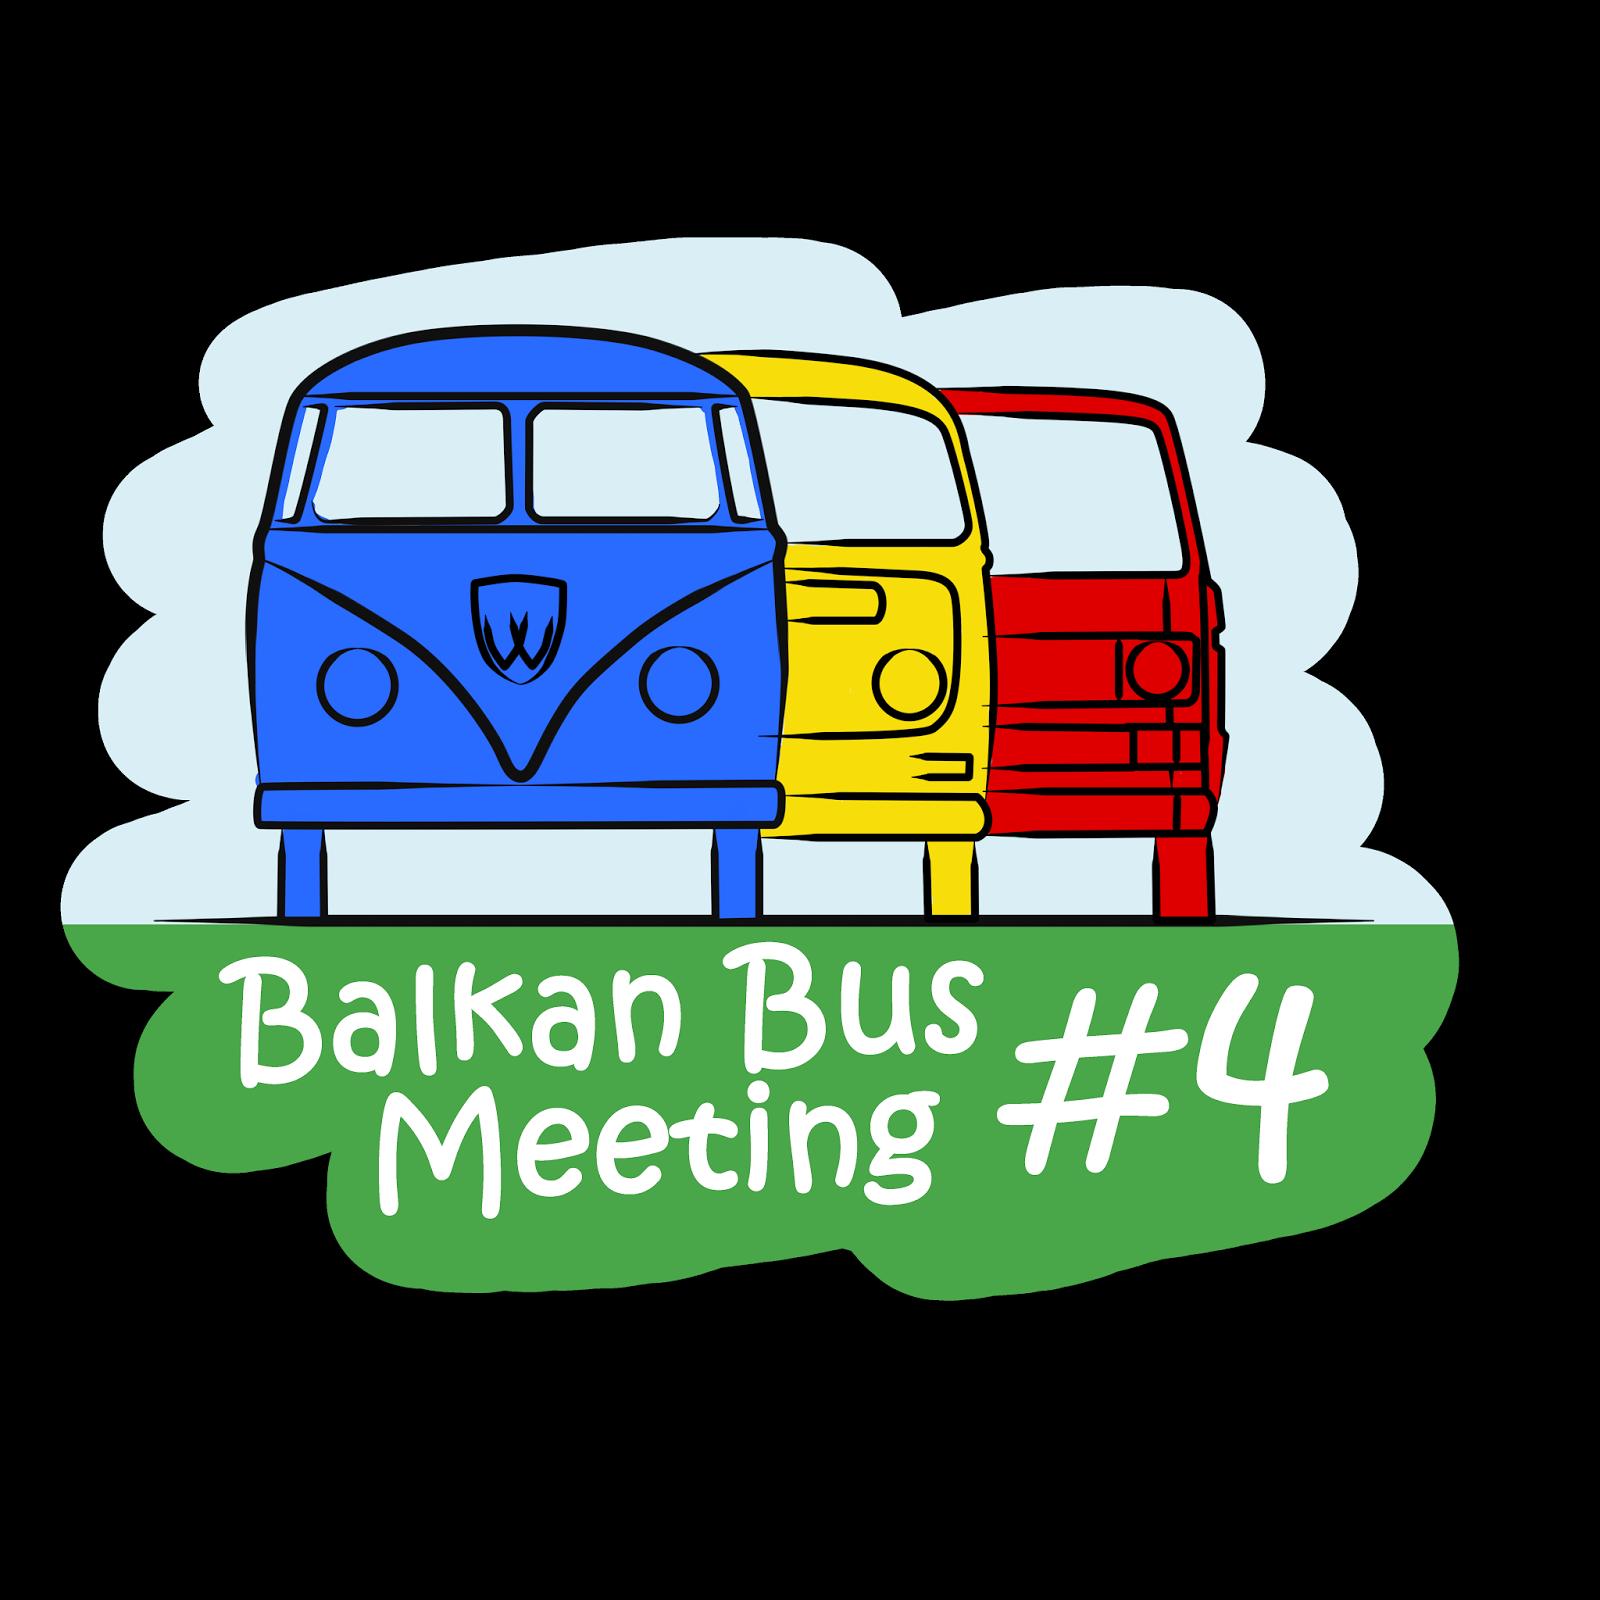 http://www.balkanbusmeeting.com/